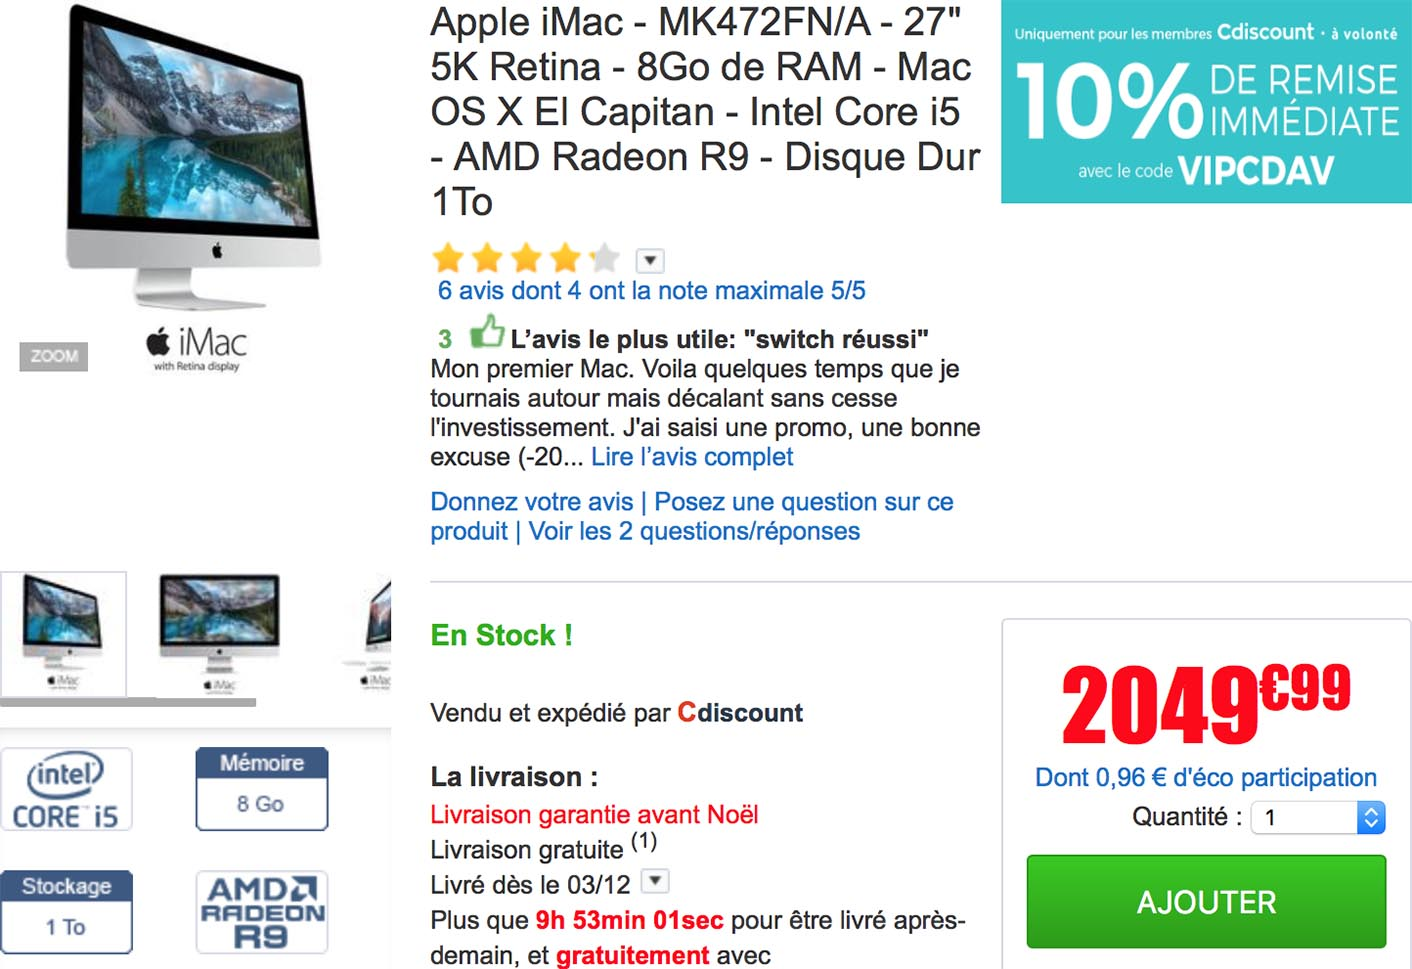 Promo iMac 5K CDiscount